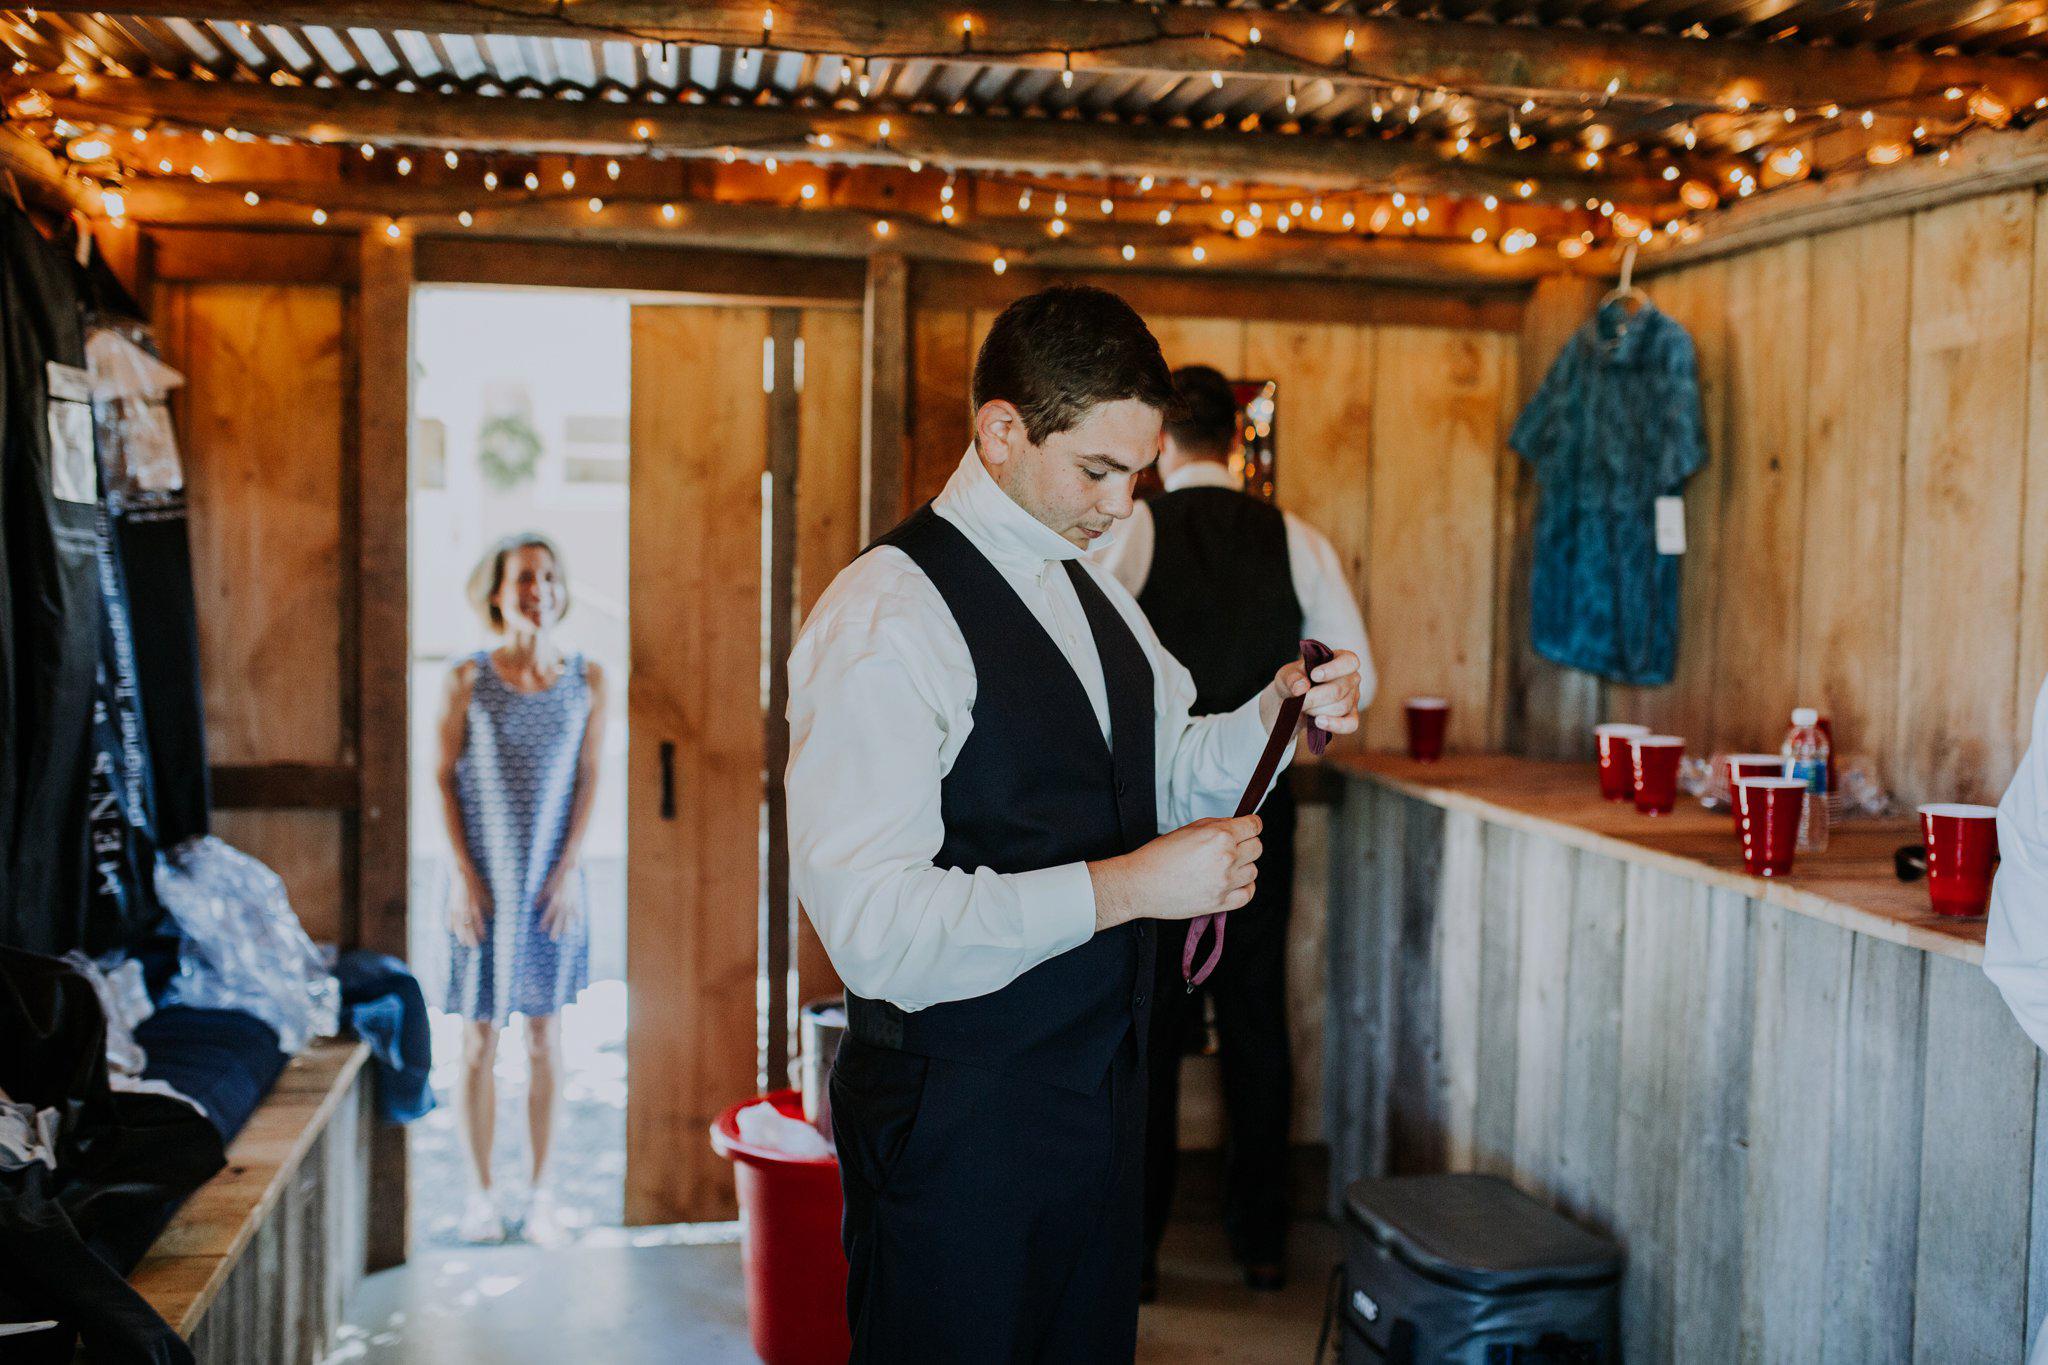 kristen-and-cody-the-kelley-farm-wedding-seattle-photographer-caitlyn-nikula-22.jpg